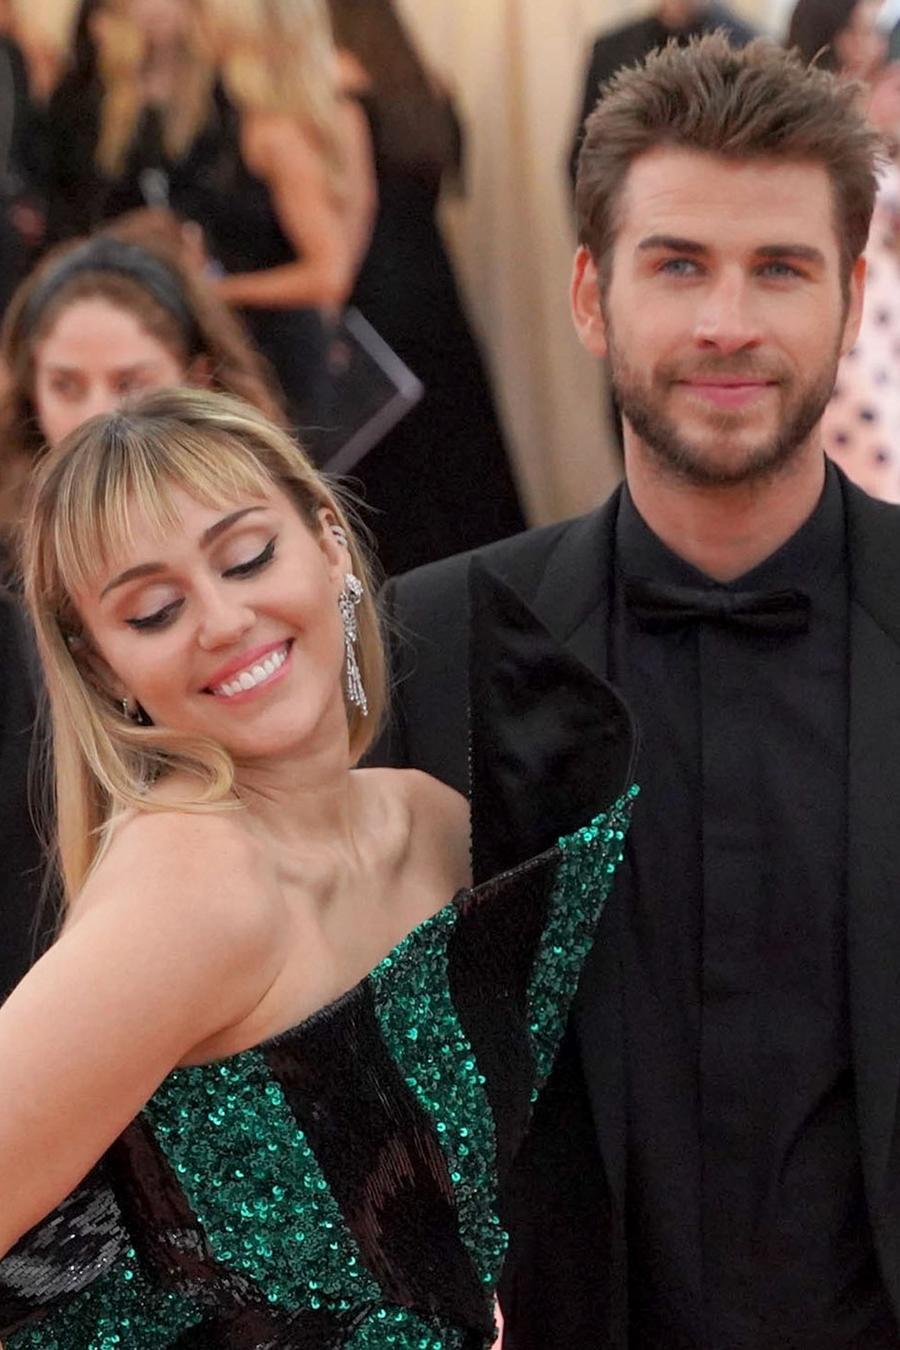 Miley Cyrus and Liam Hemsworth call it splits on social media